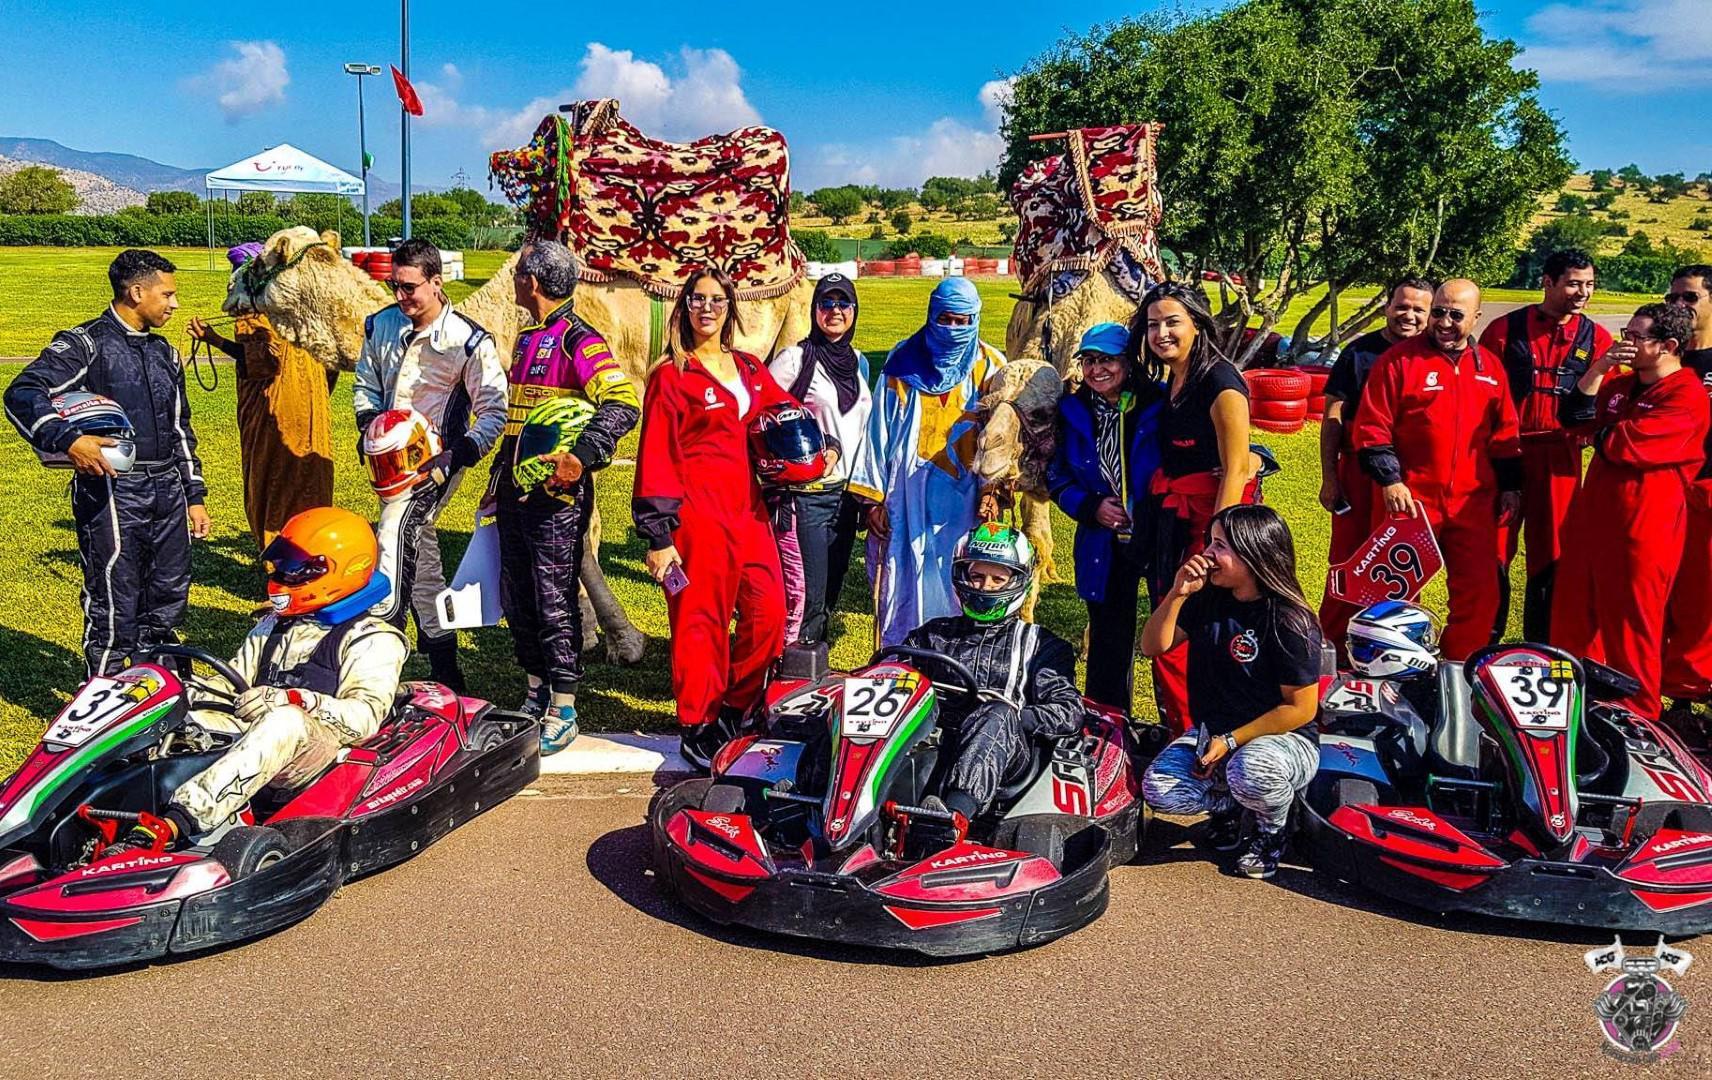 l-experience-des-24-heures-d-endurance-karting-d-agadir-927-5.jpg